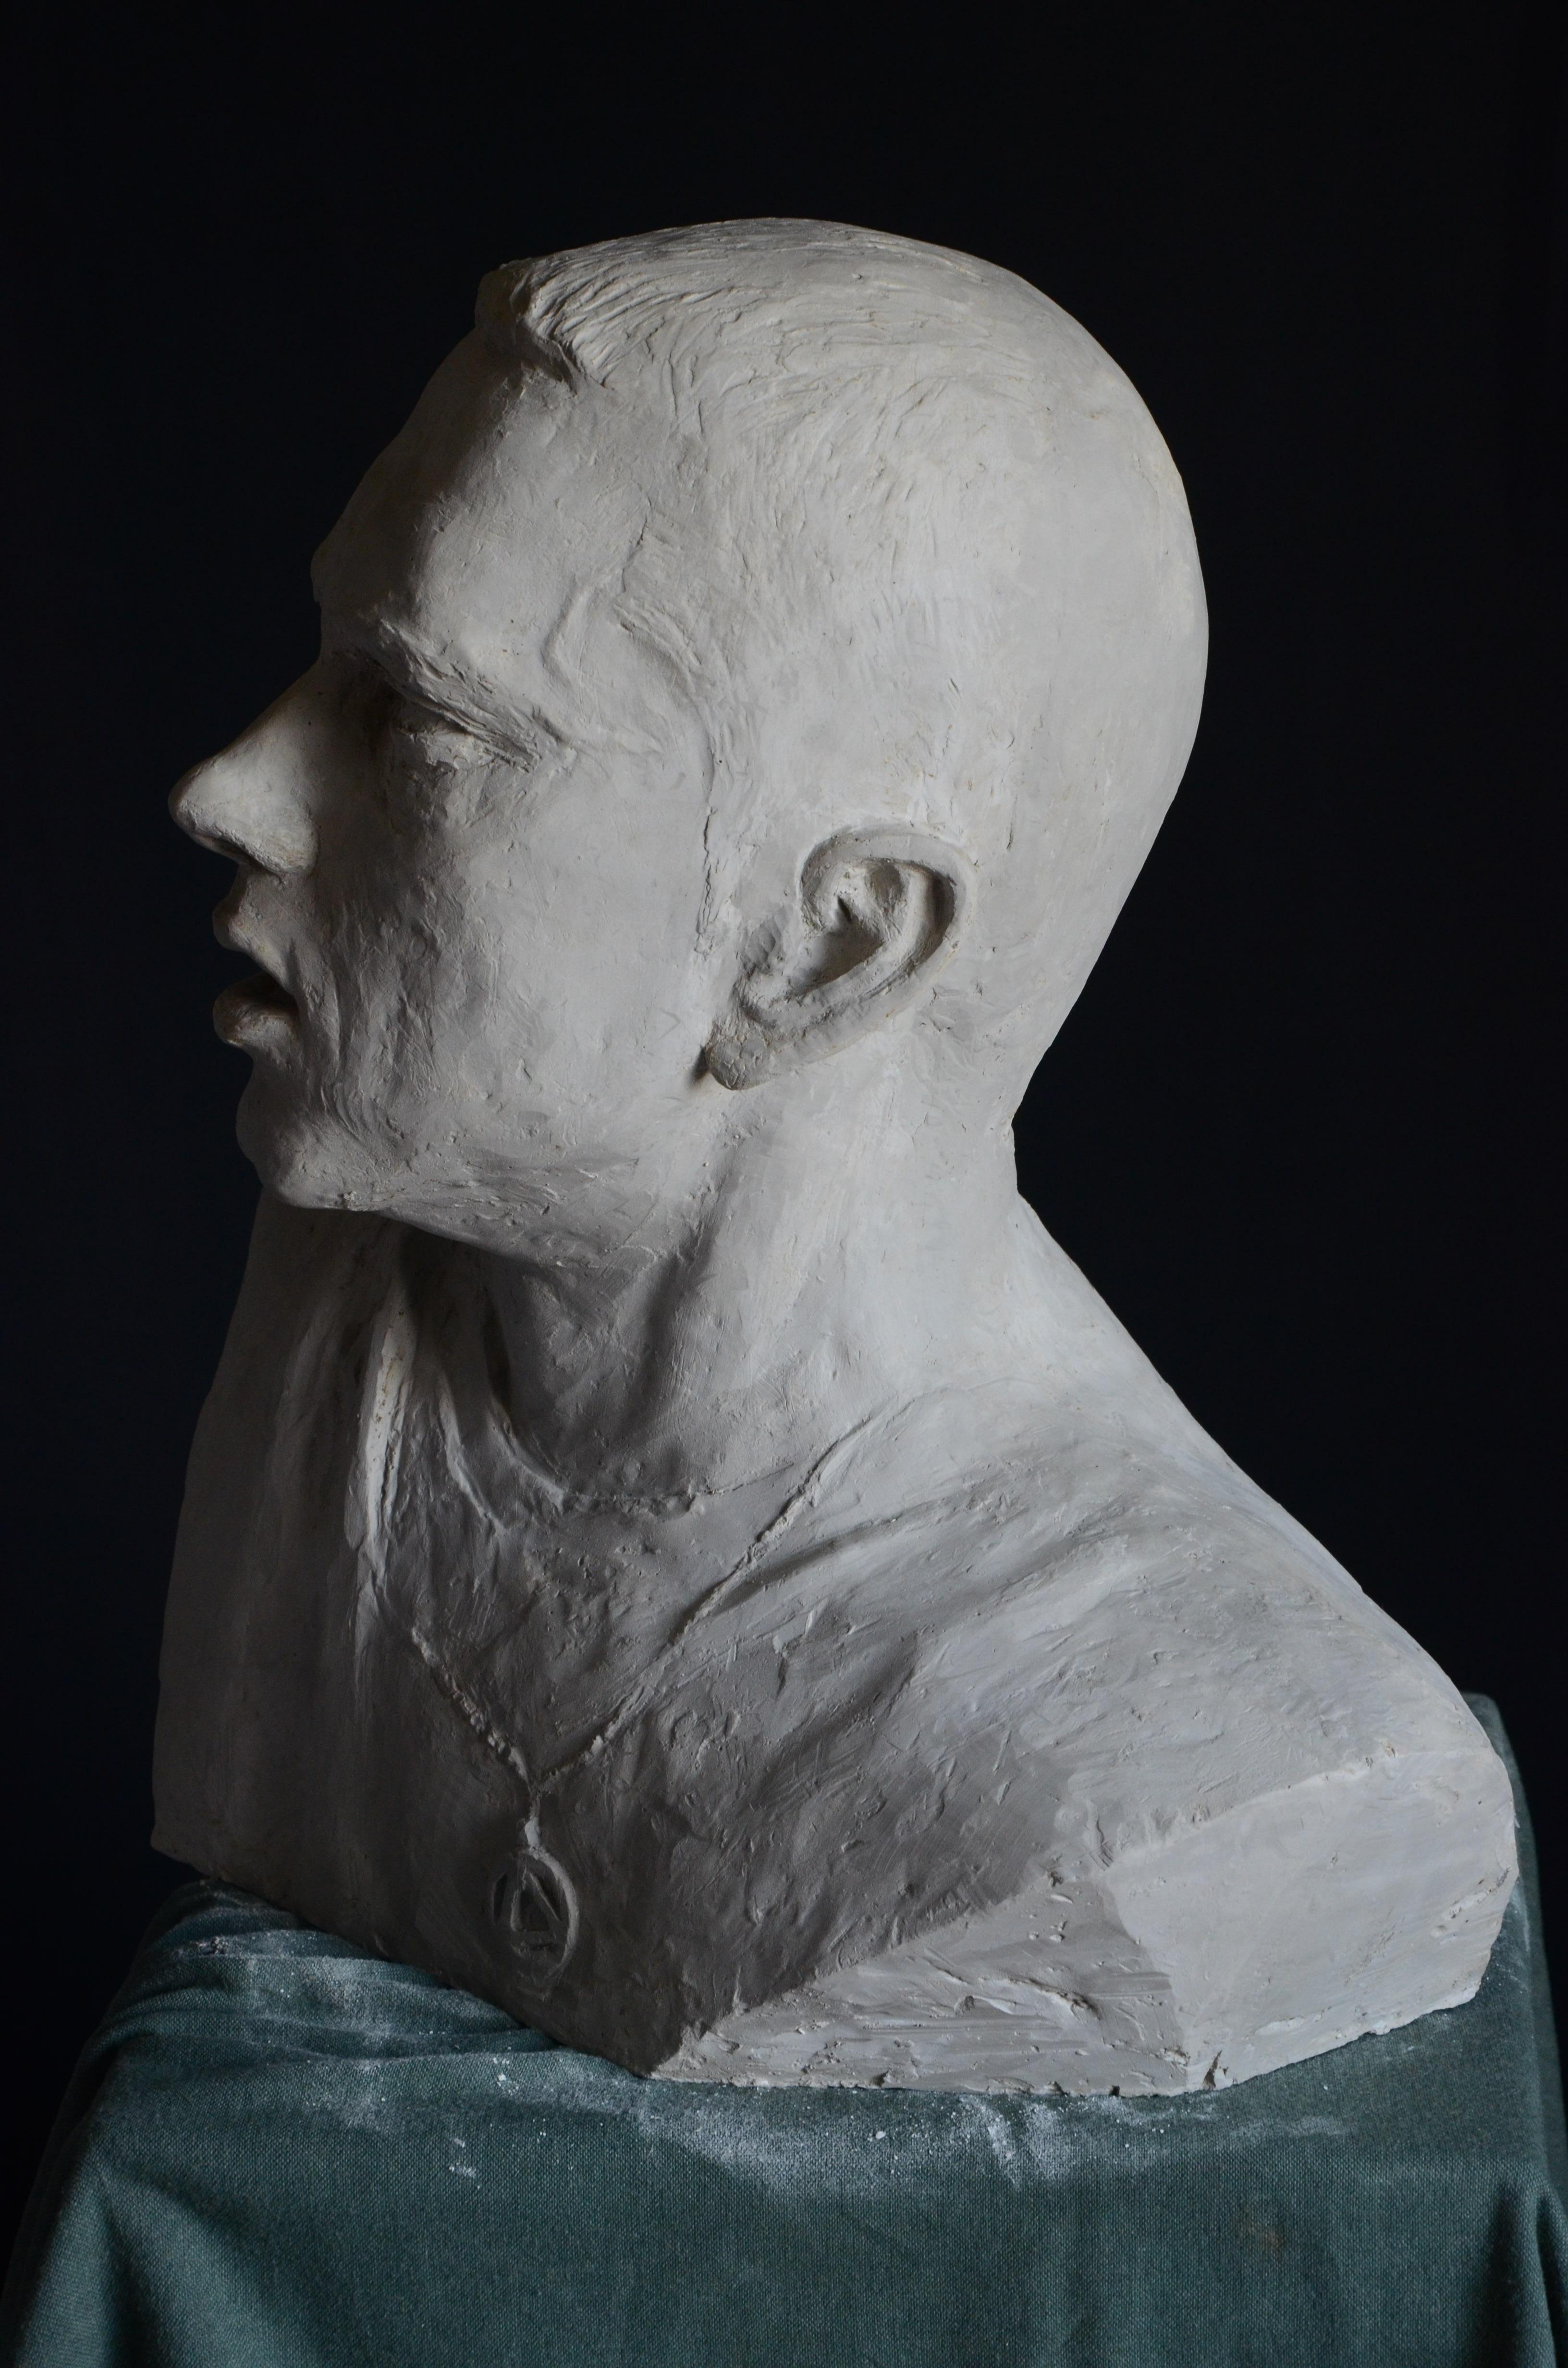 Фанат Эминема создал бюст рэпера из гипса. Eminem, Aleksander Walijewski